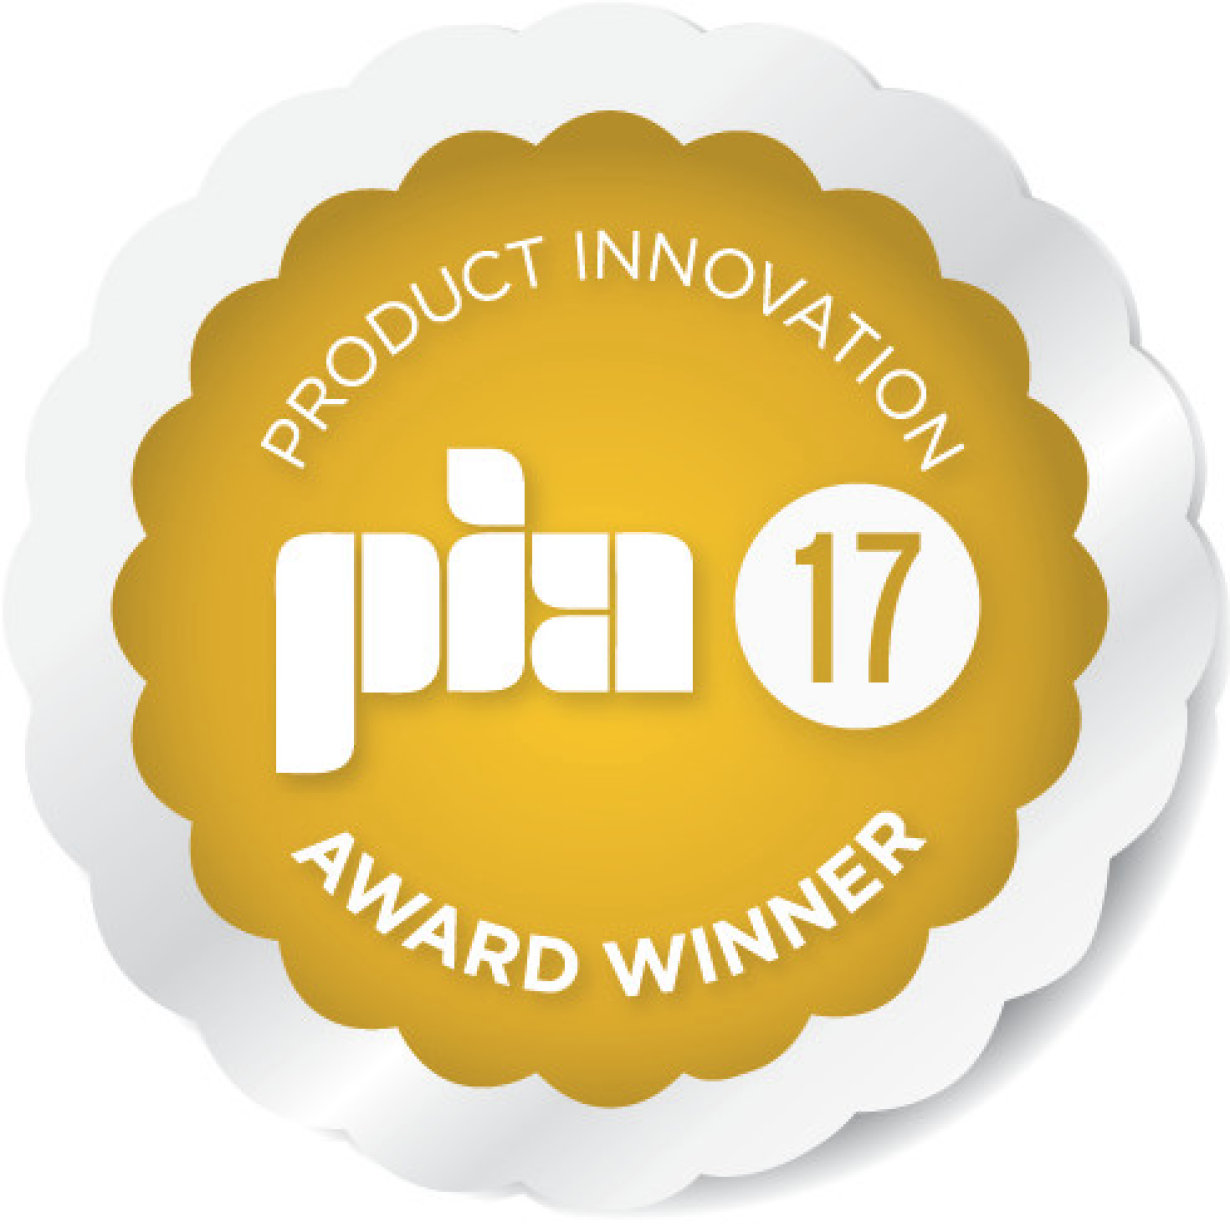 Osram Opto Semiconductors' Filament LED Wins Prestigious Product Innovation Award